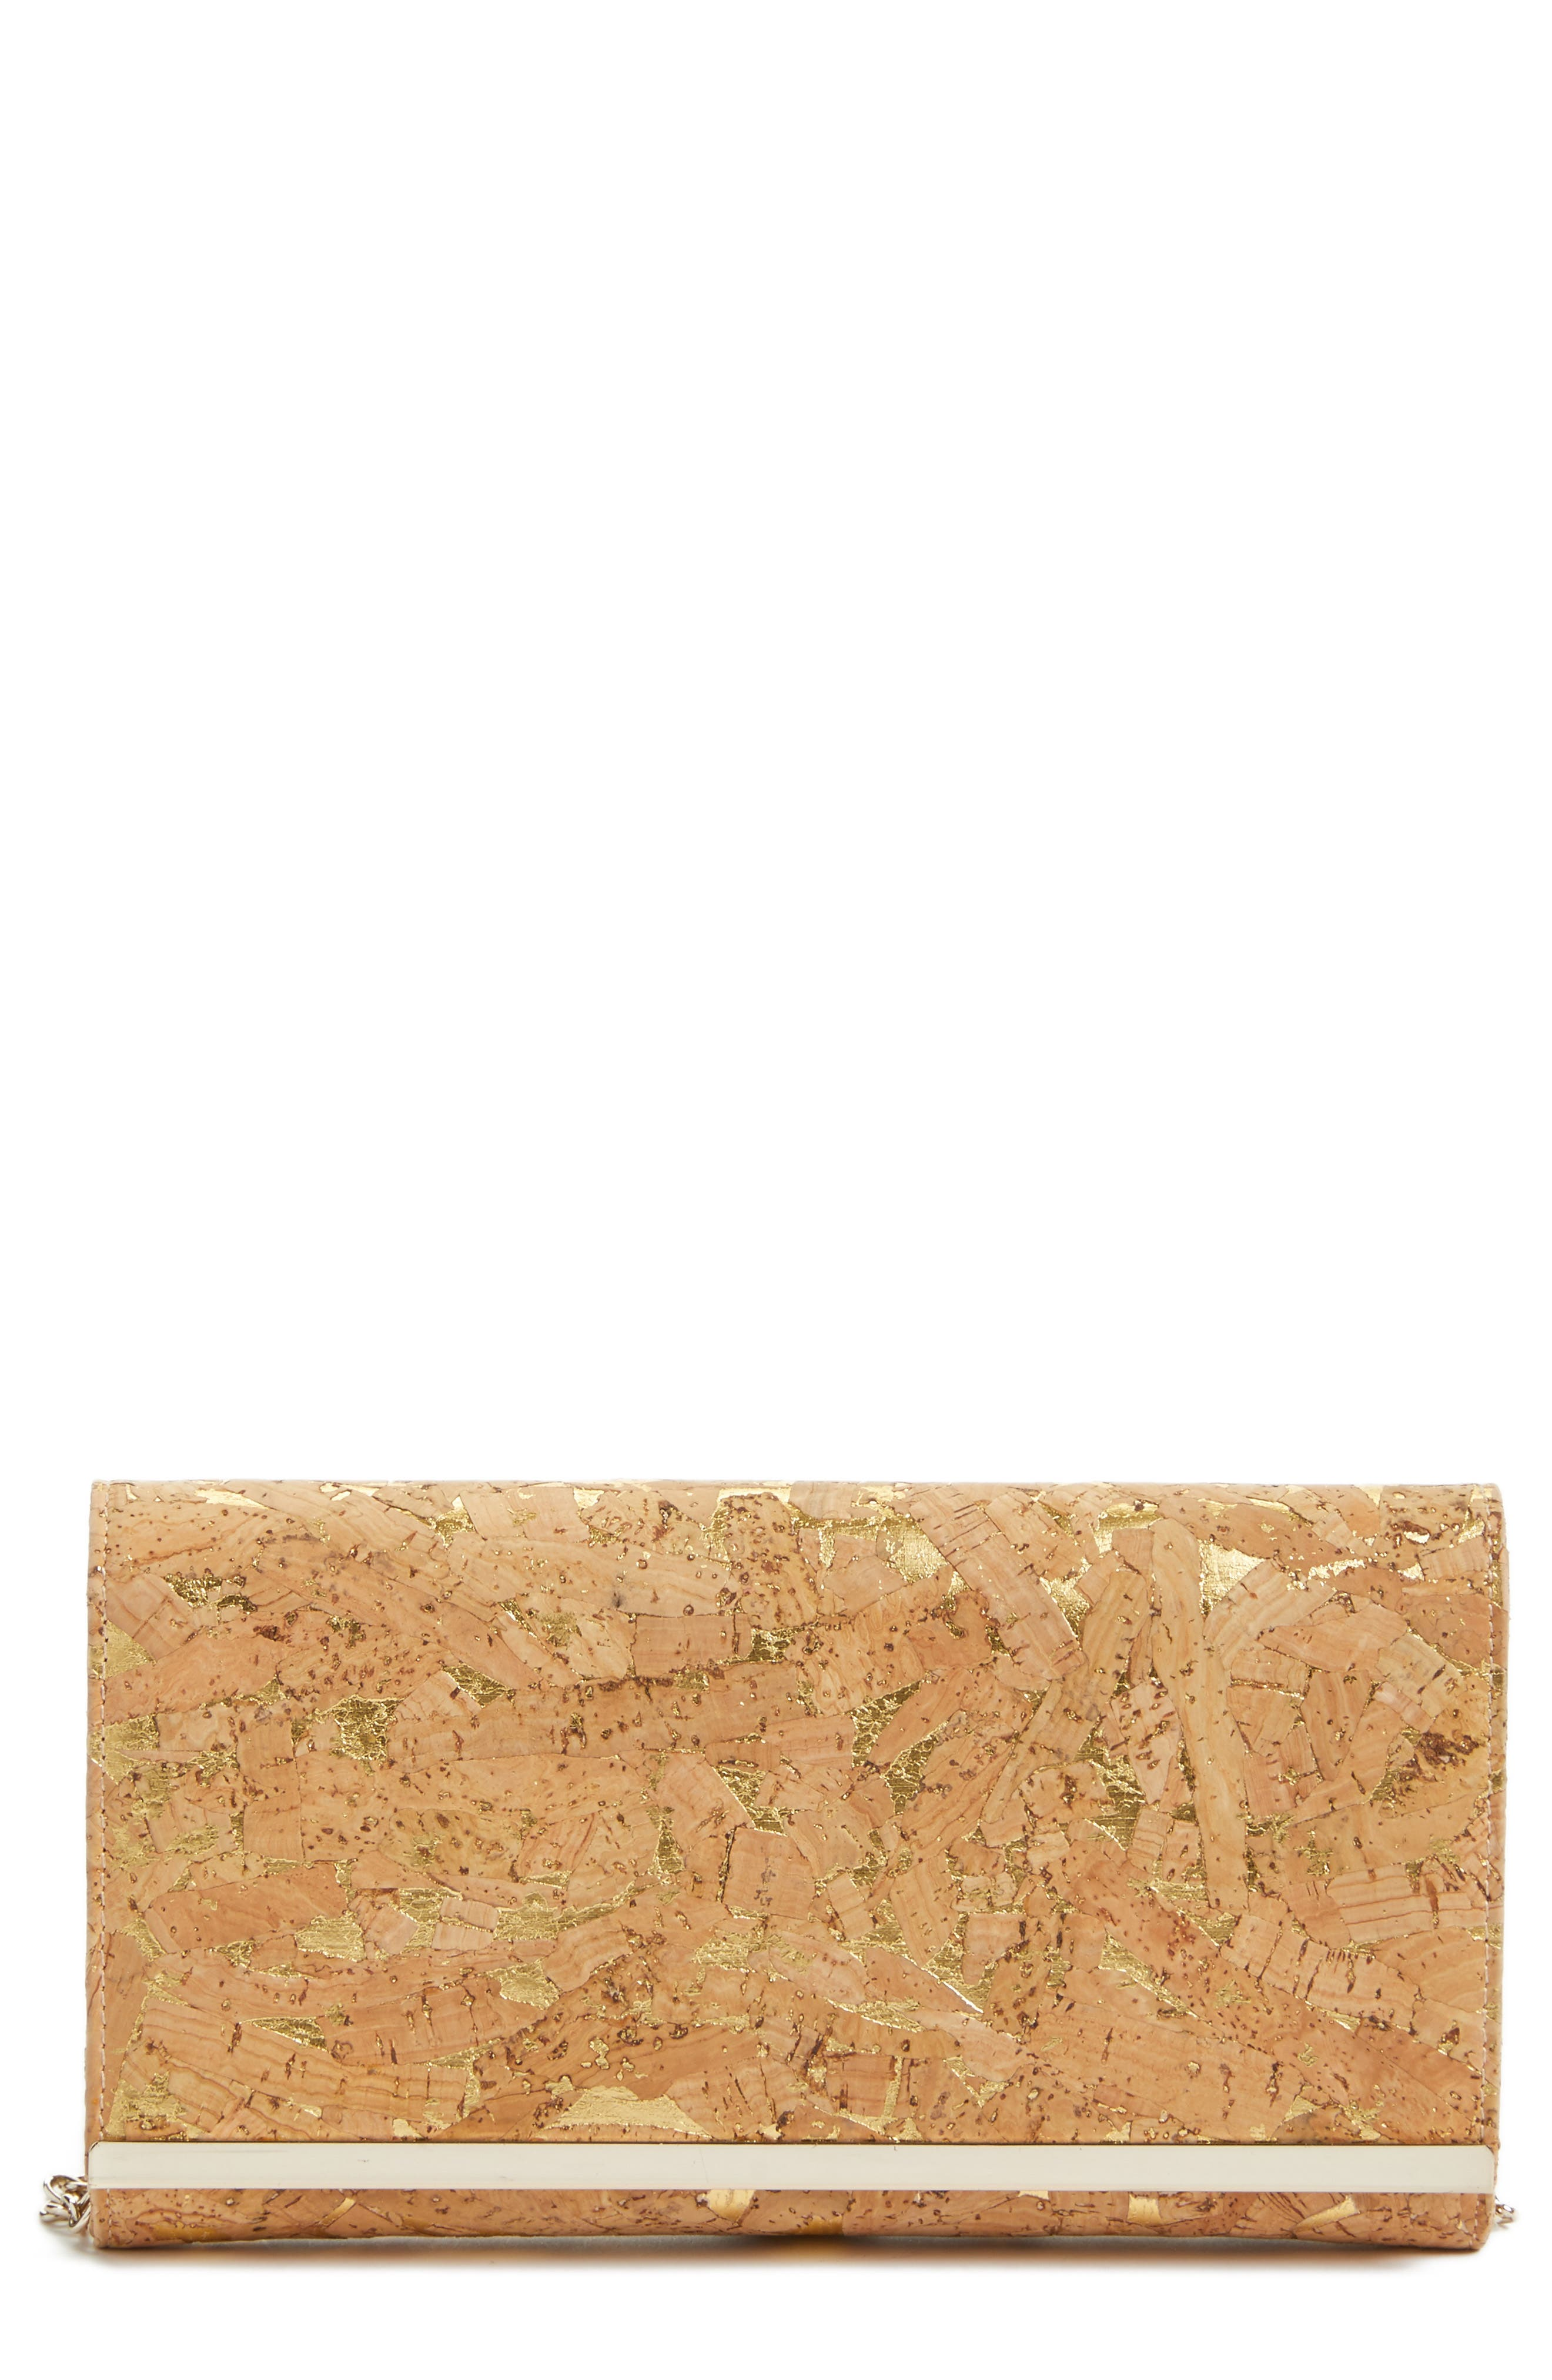 NORDSTROM, Metallic Cork Clutch, Main thumbnail 1, color, NATURAL/GOLD